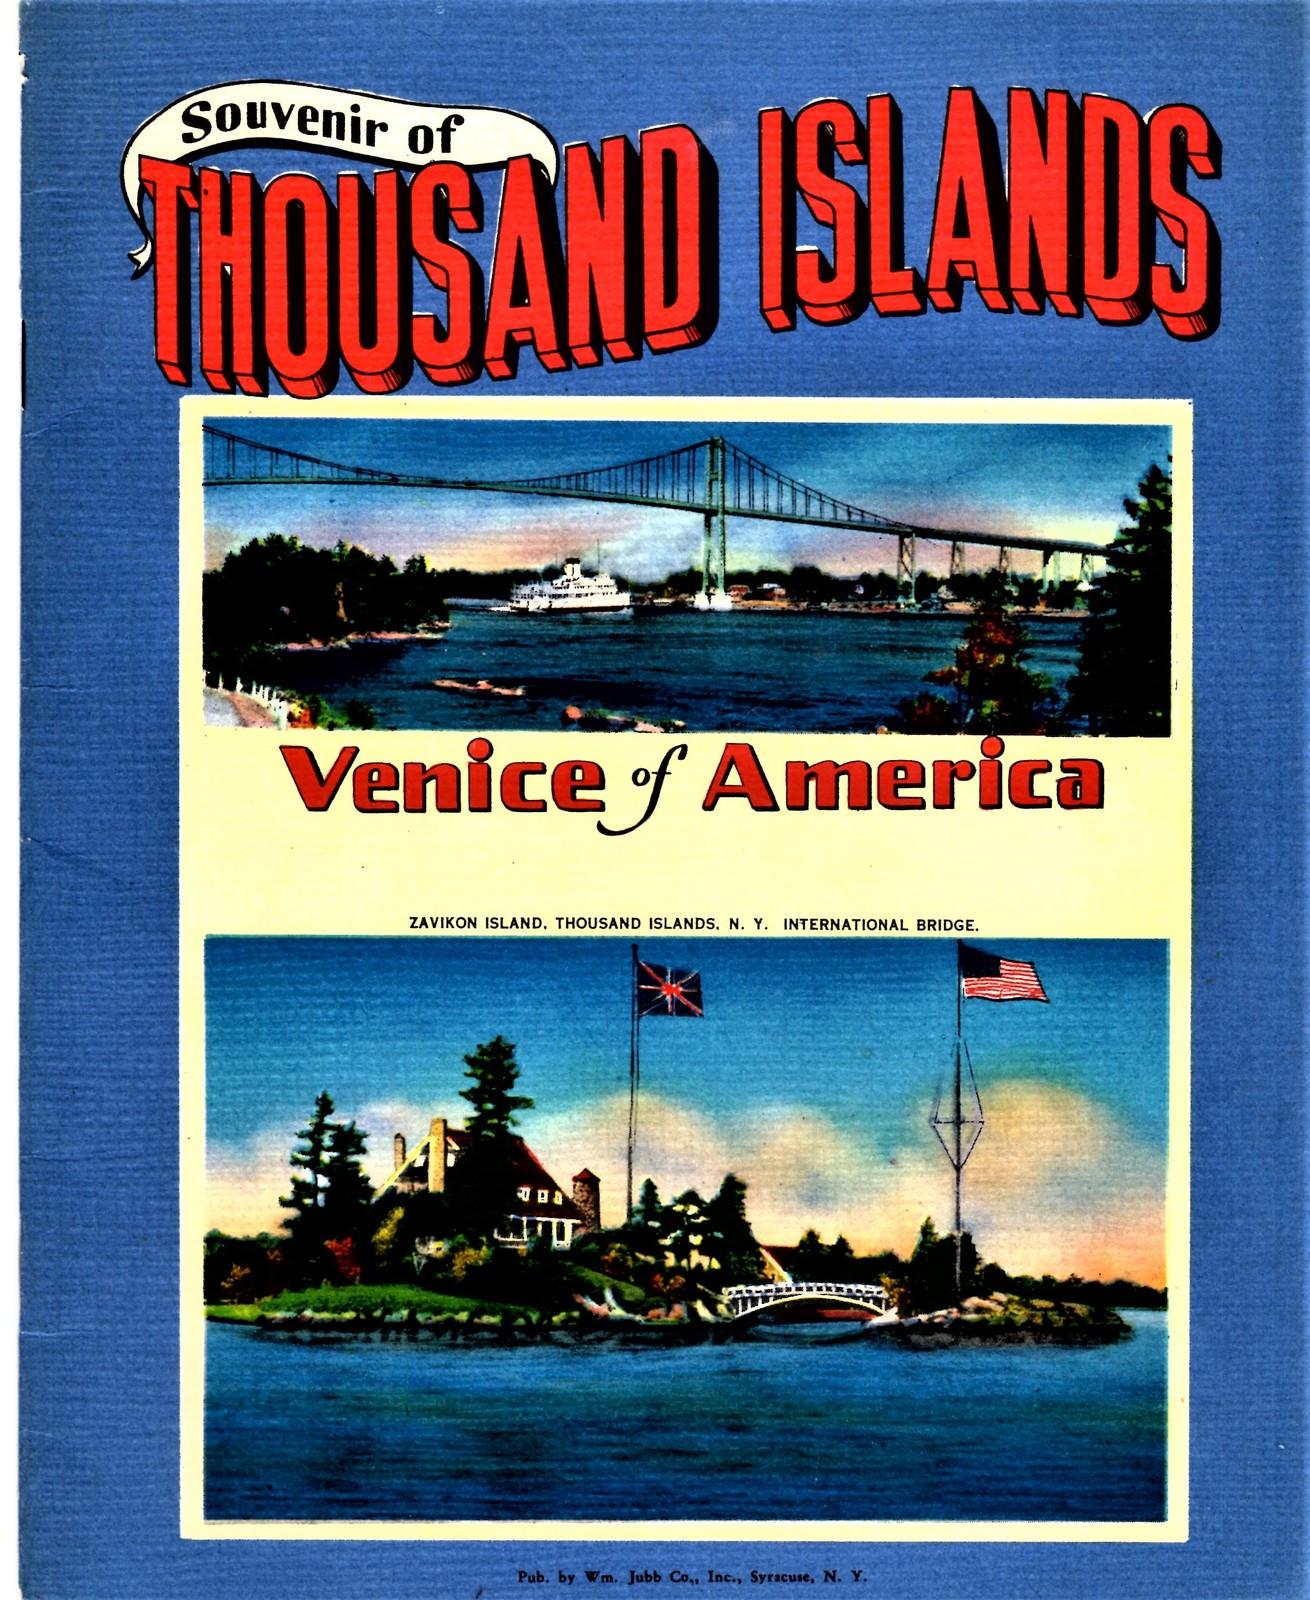 Thousand Islands Venice Of America Book & Souvenir Photo Booklet